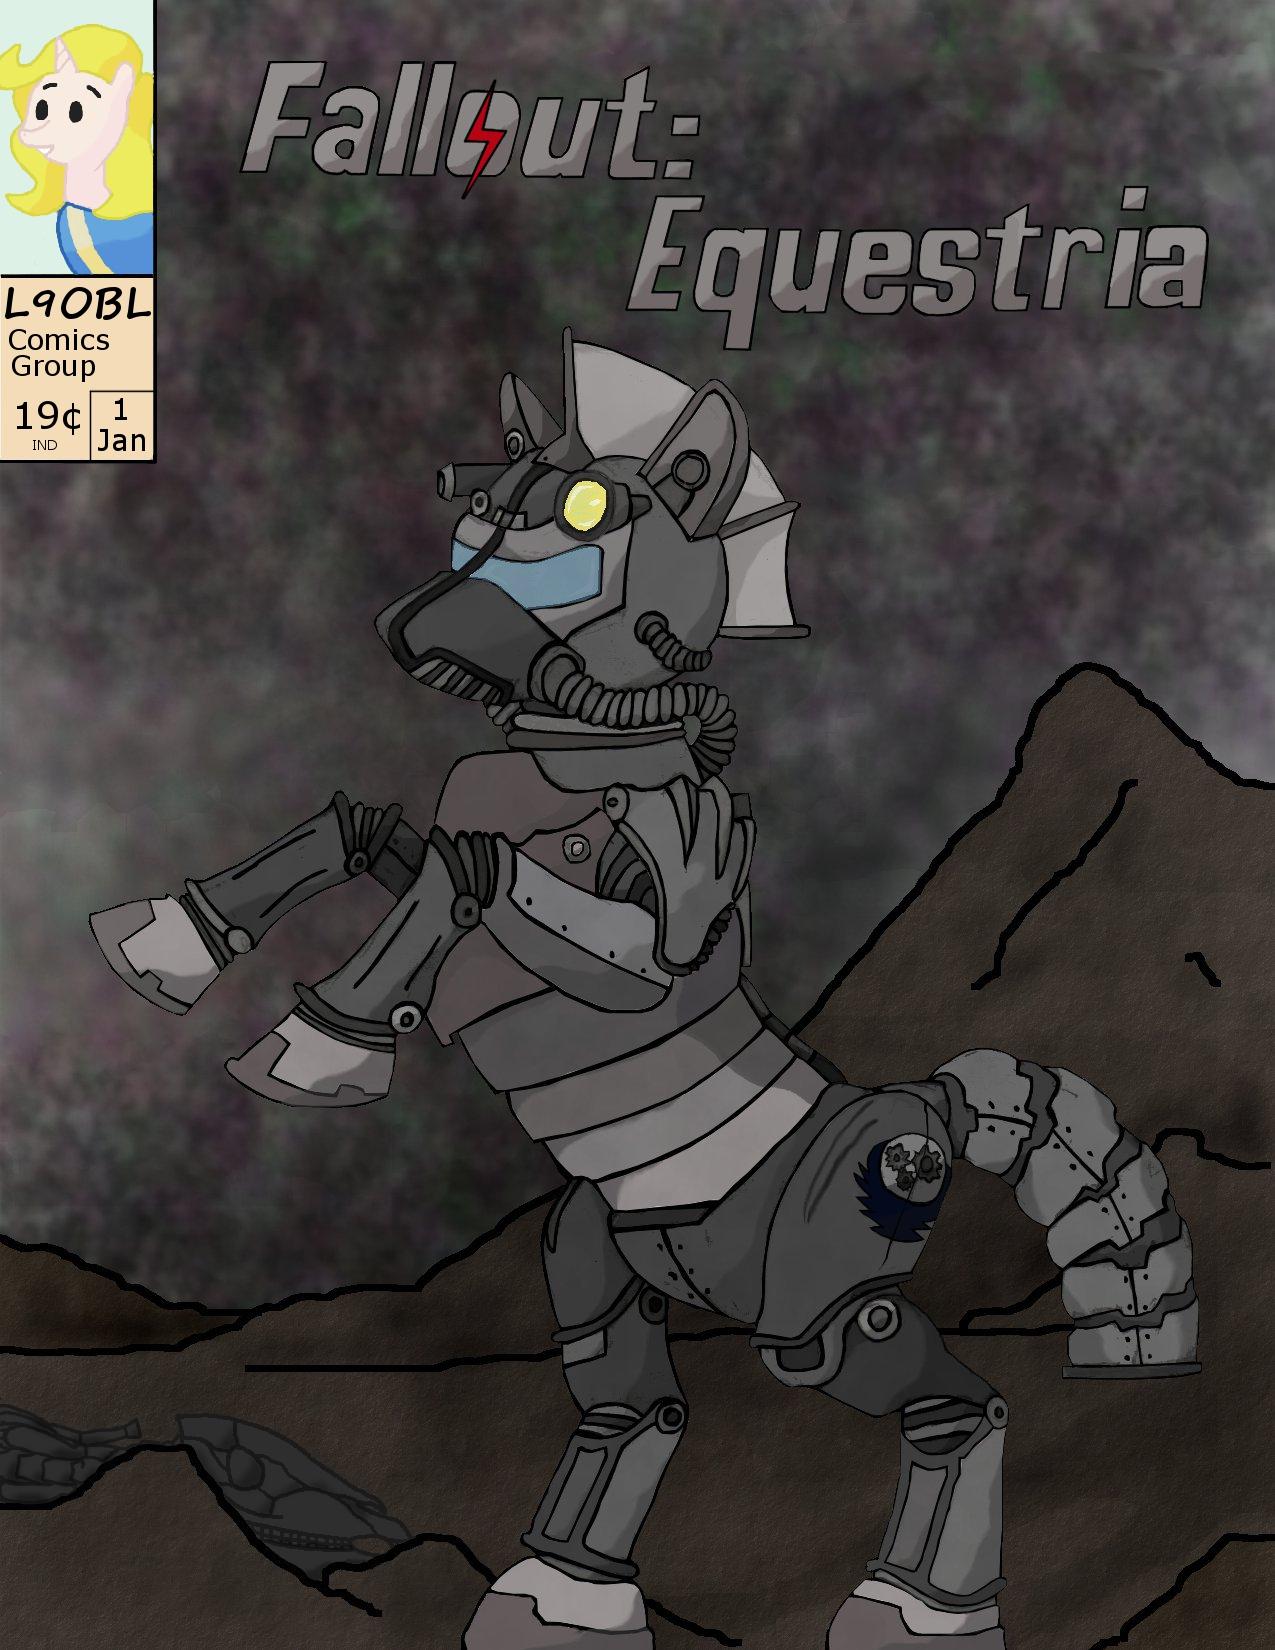 Fallout Equestria: The Hand Drawn Comic Issue 1